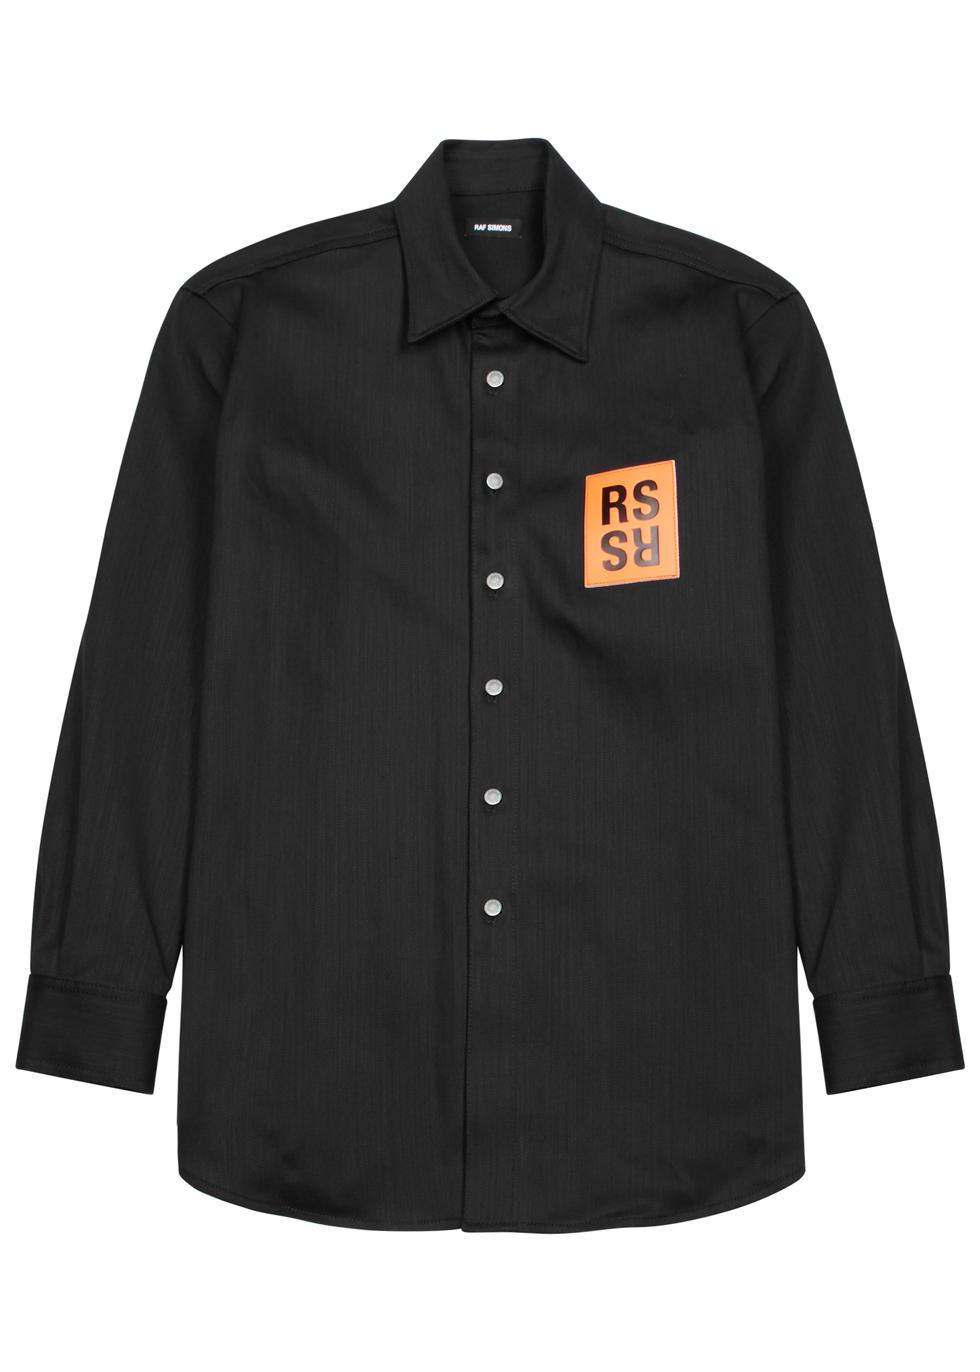 Oversized Logo Patch Denim Shirt In Black